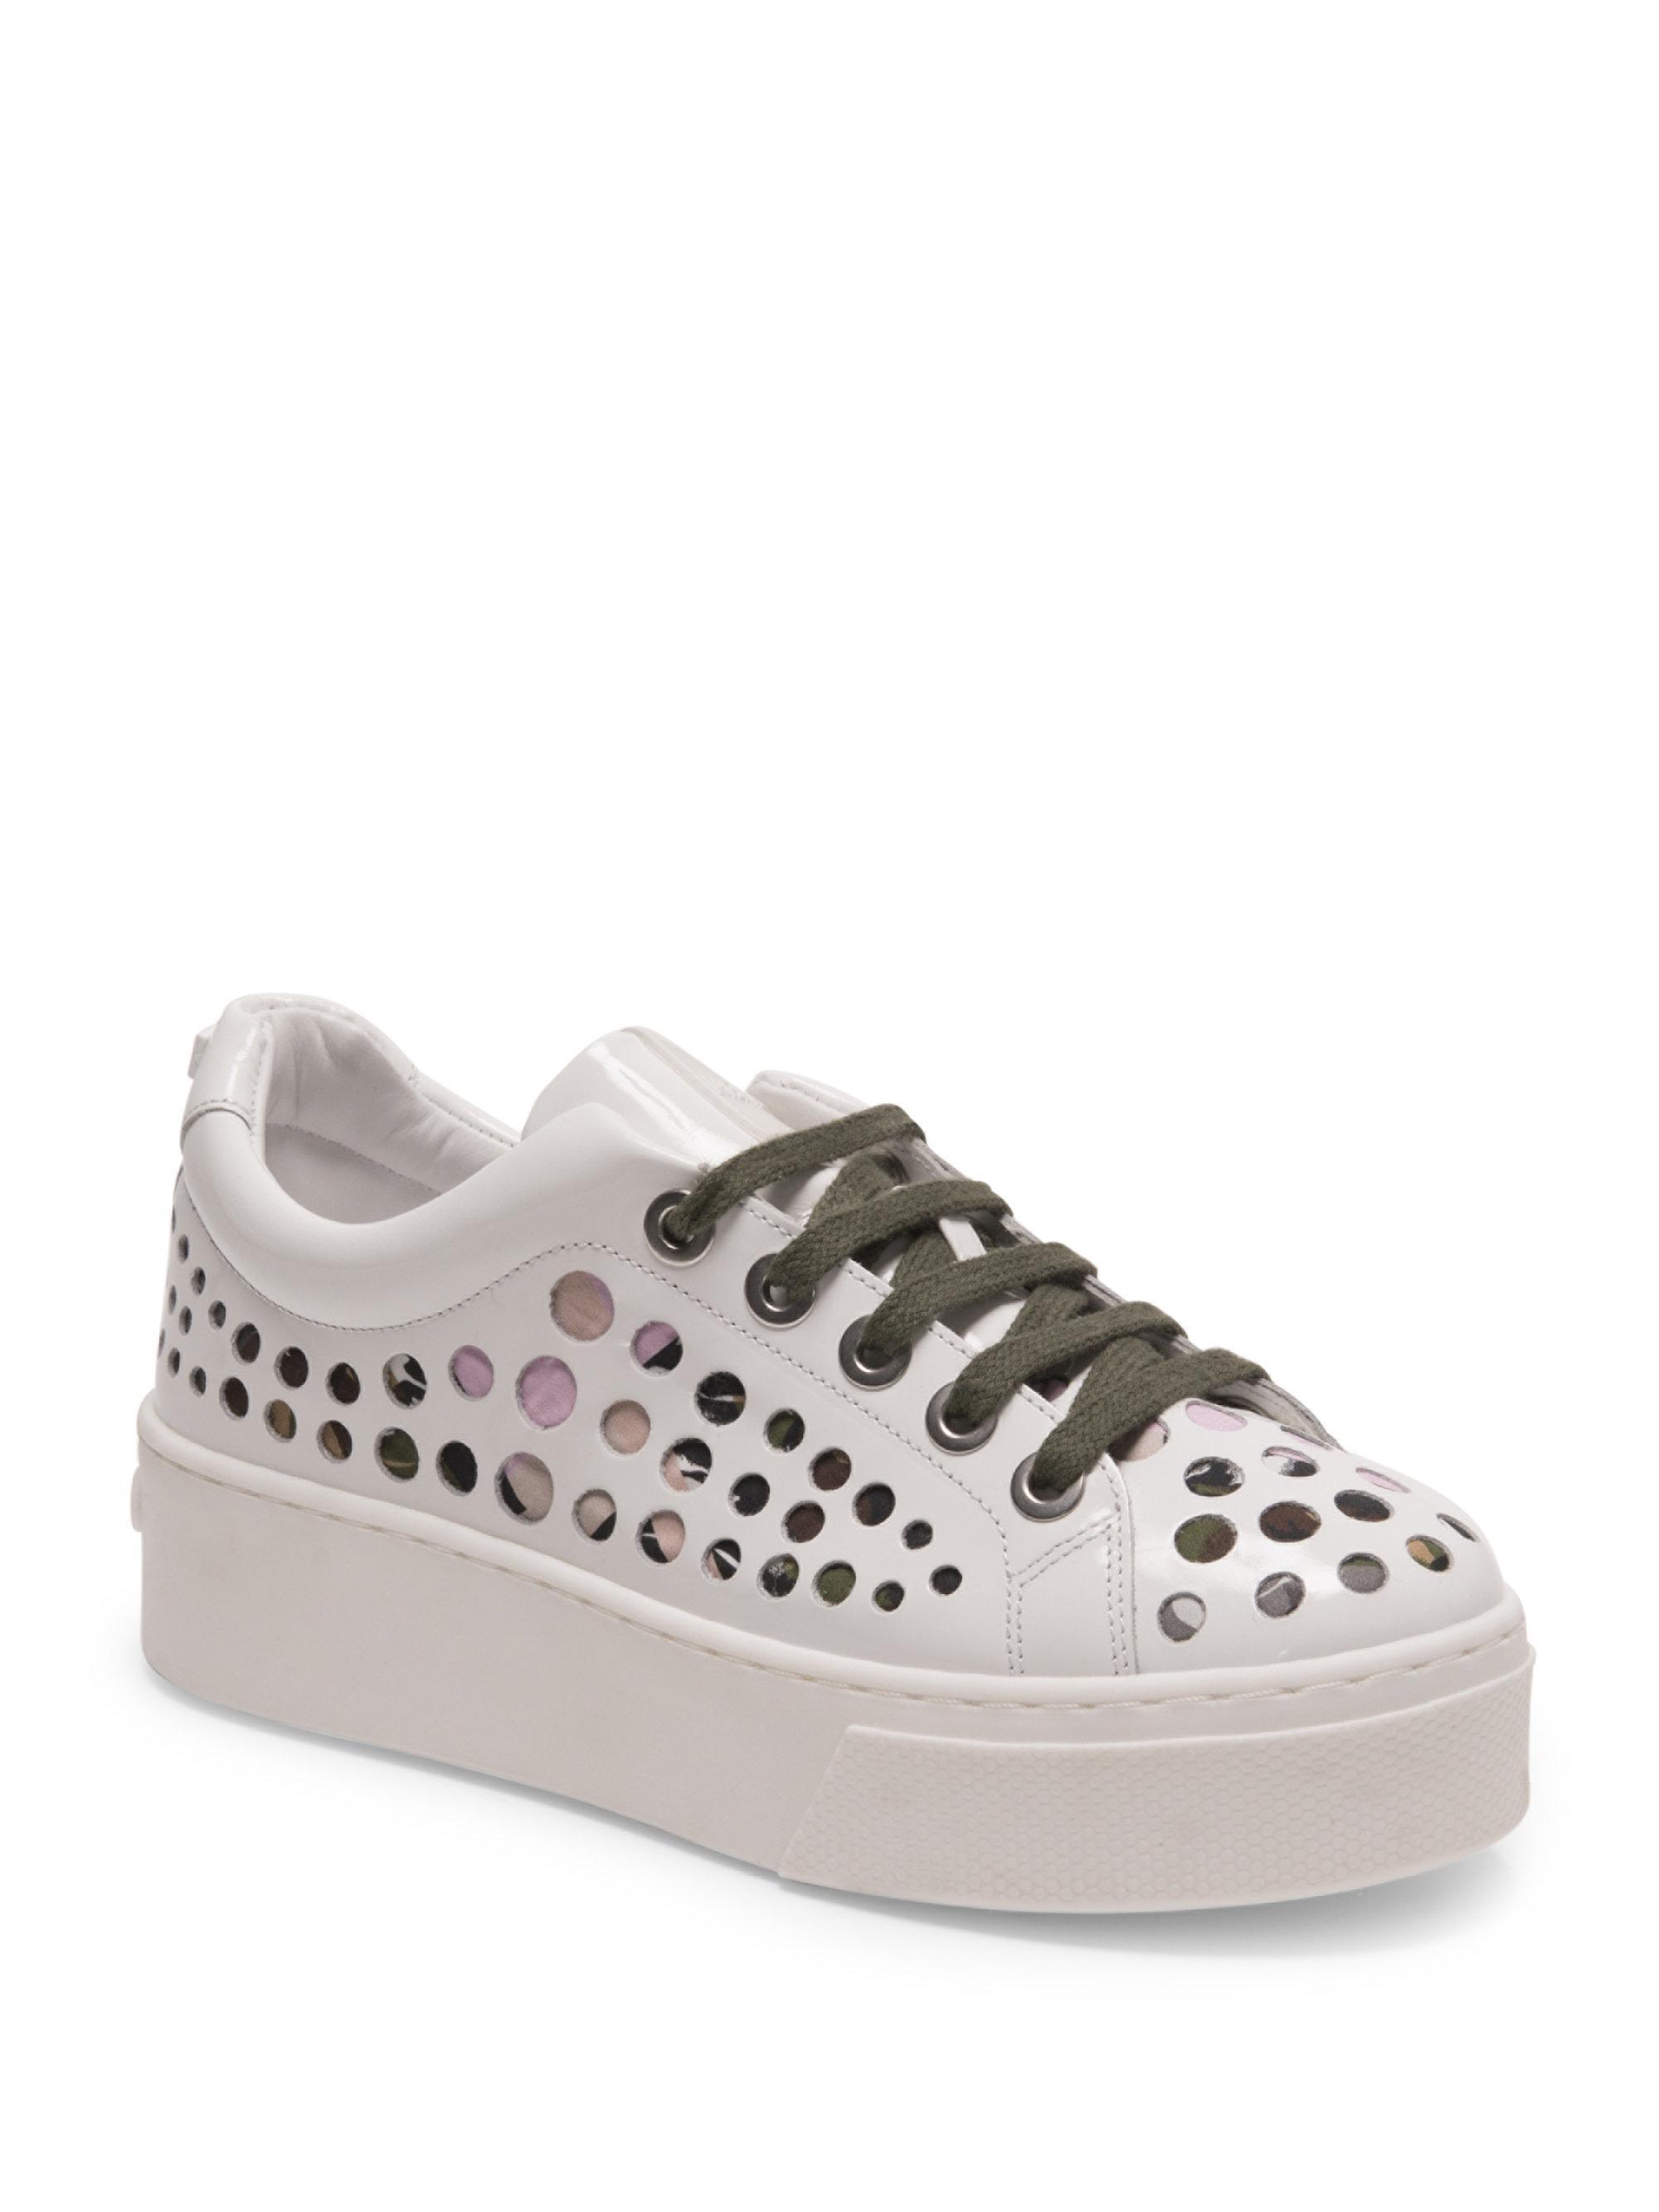 Kenzo Patent K-Lace Platform Sneakers 3T2Mb7H